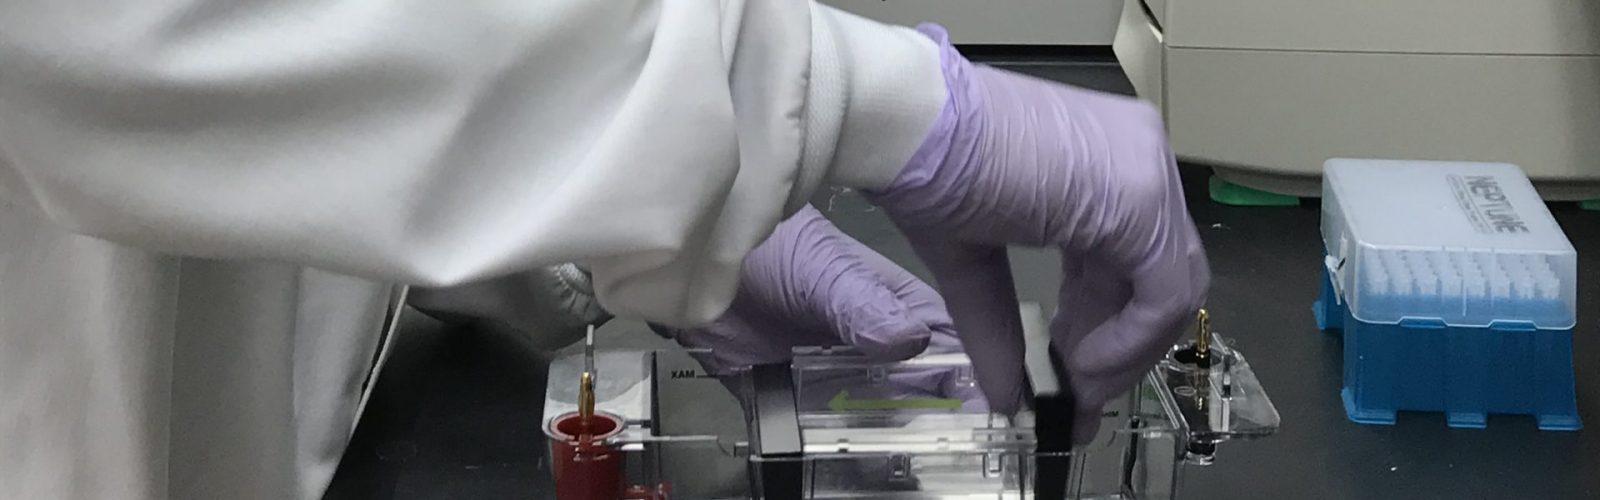 Action image of preparation work to cast agarose gel